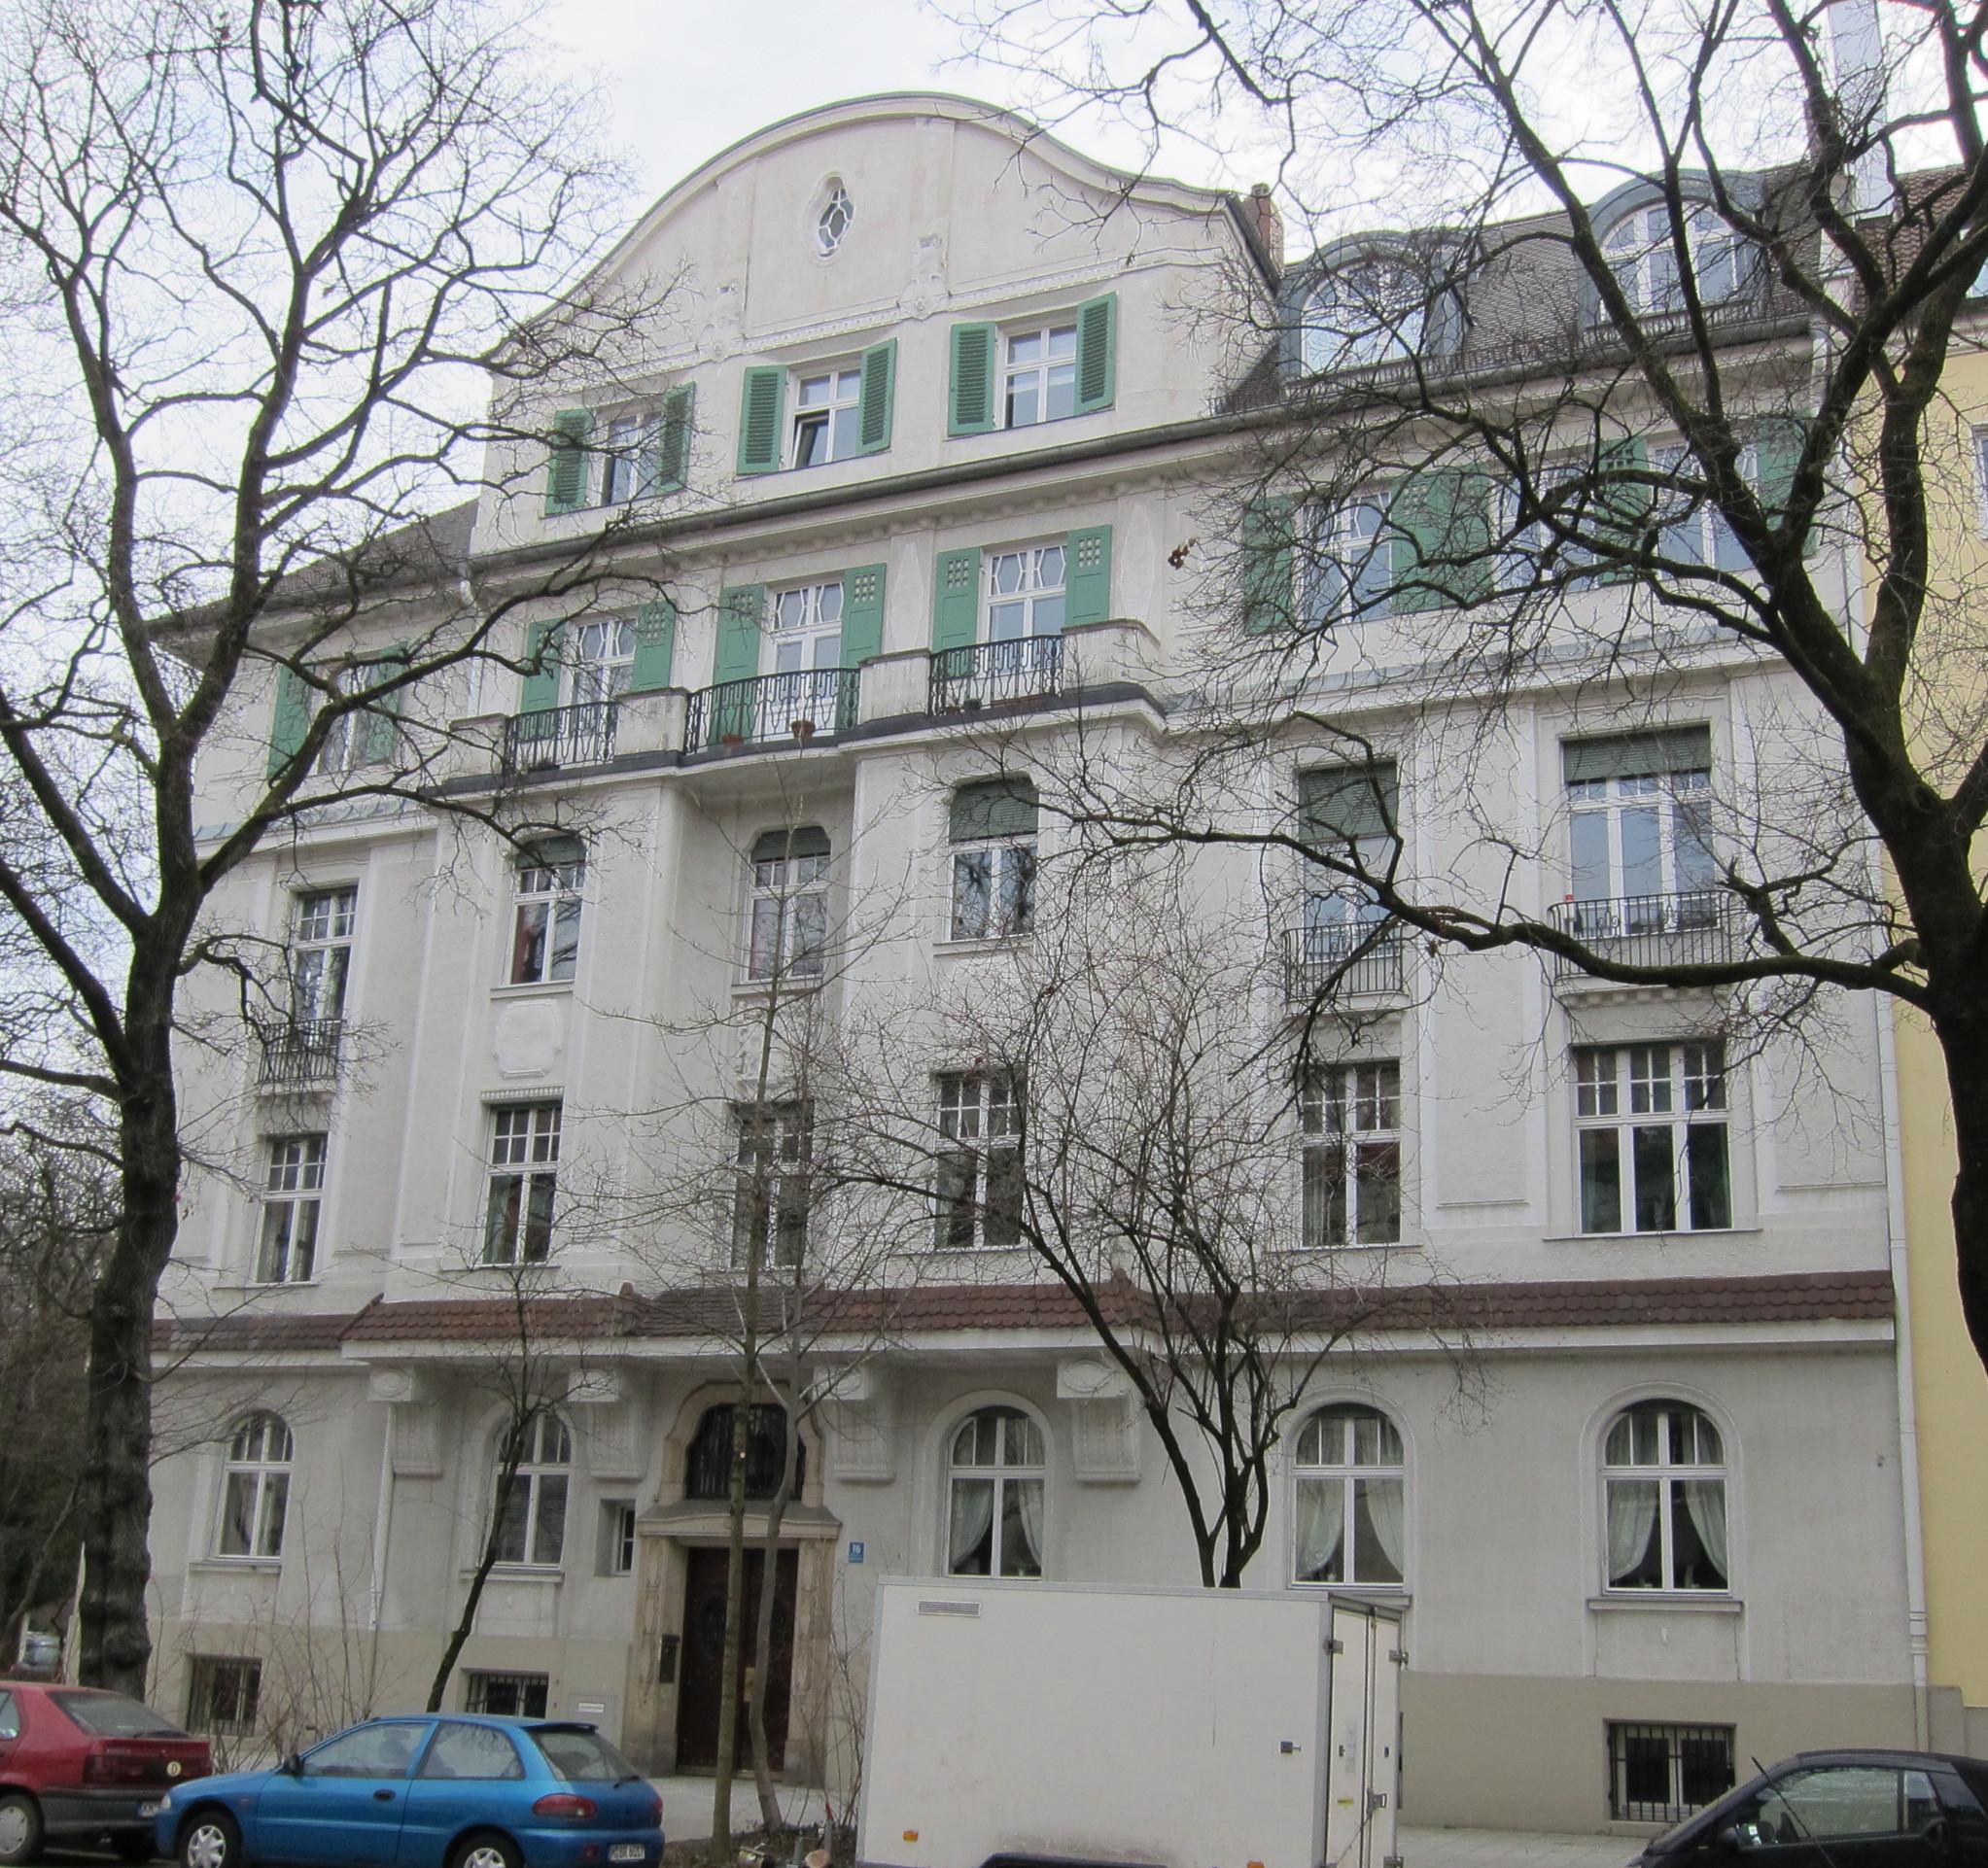 Mauerkircherstr München file mauerkircherstr 16 muenchen 02 jpg wikimedia commons